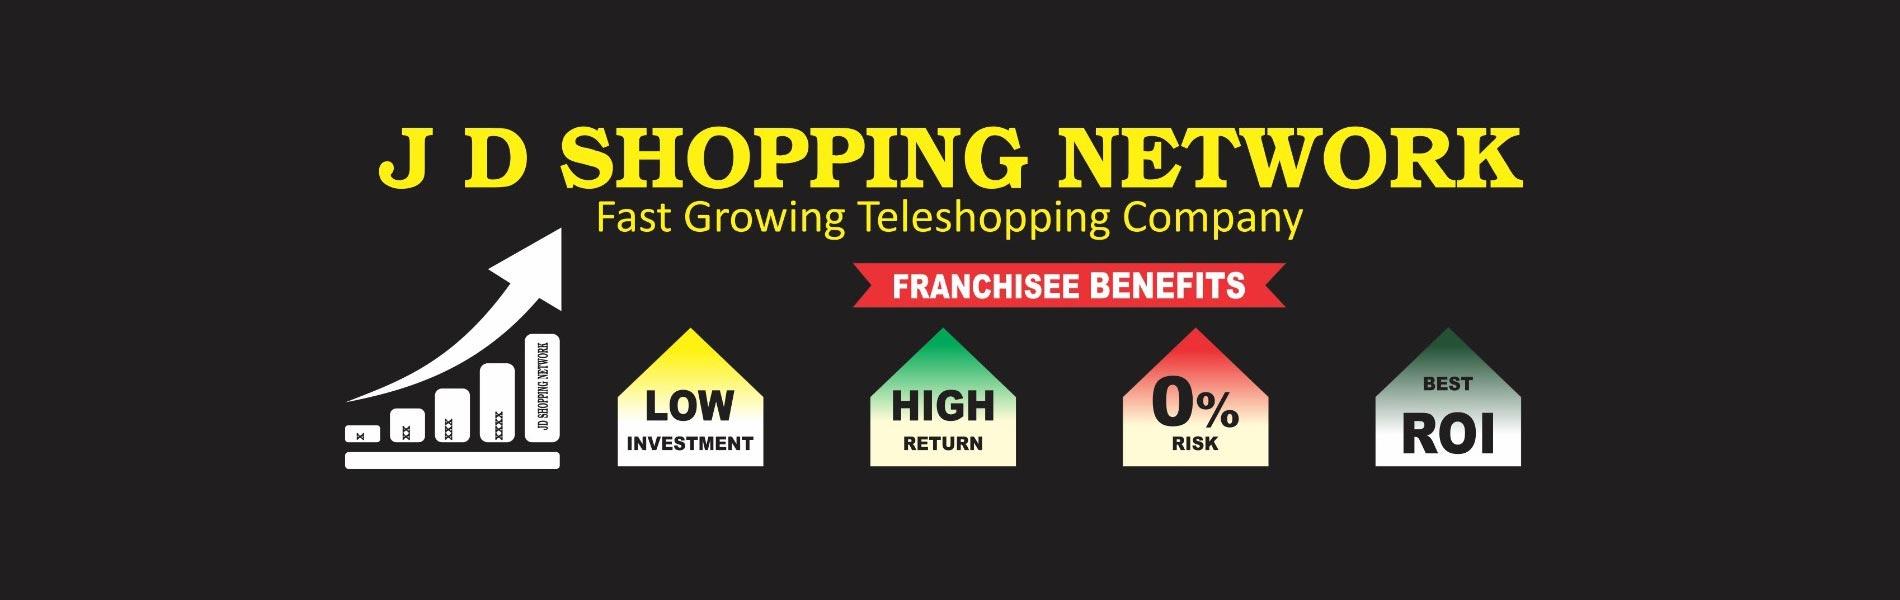 JD shopping network